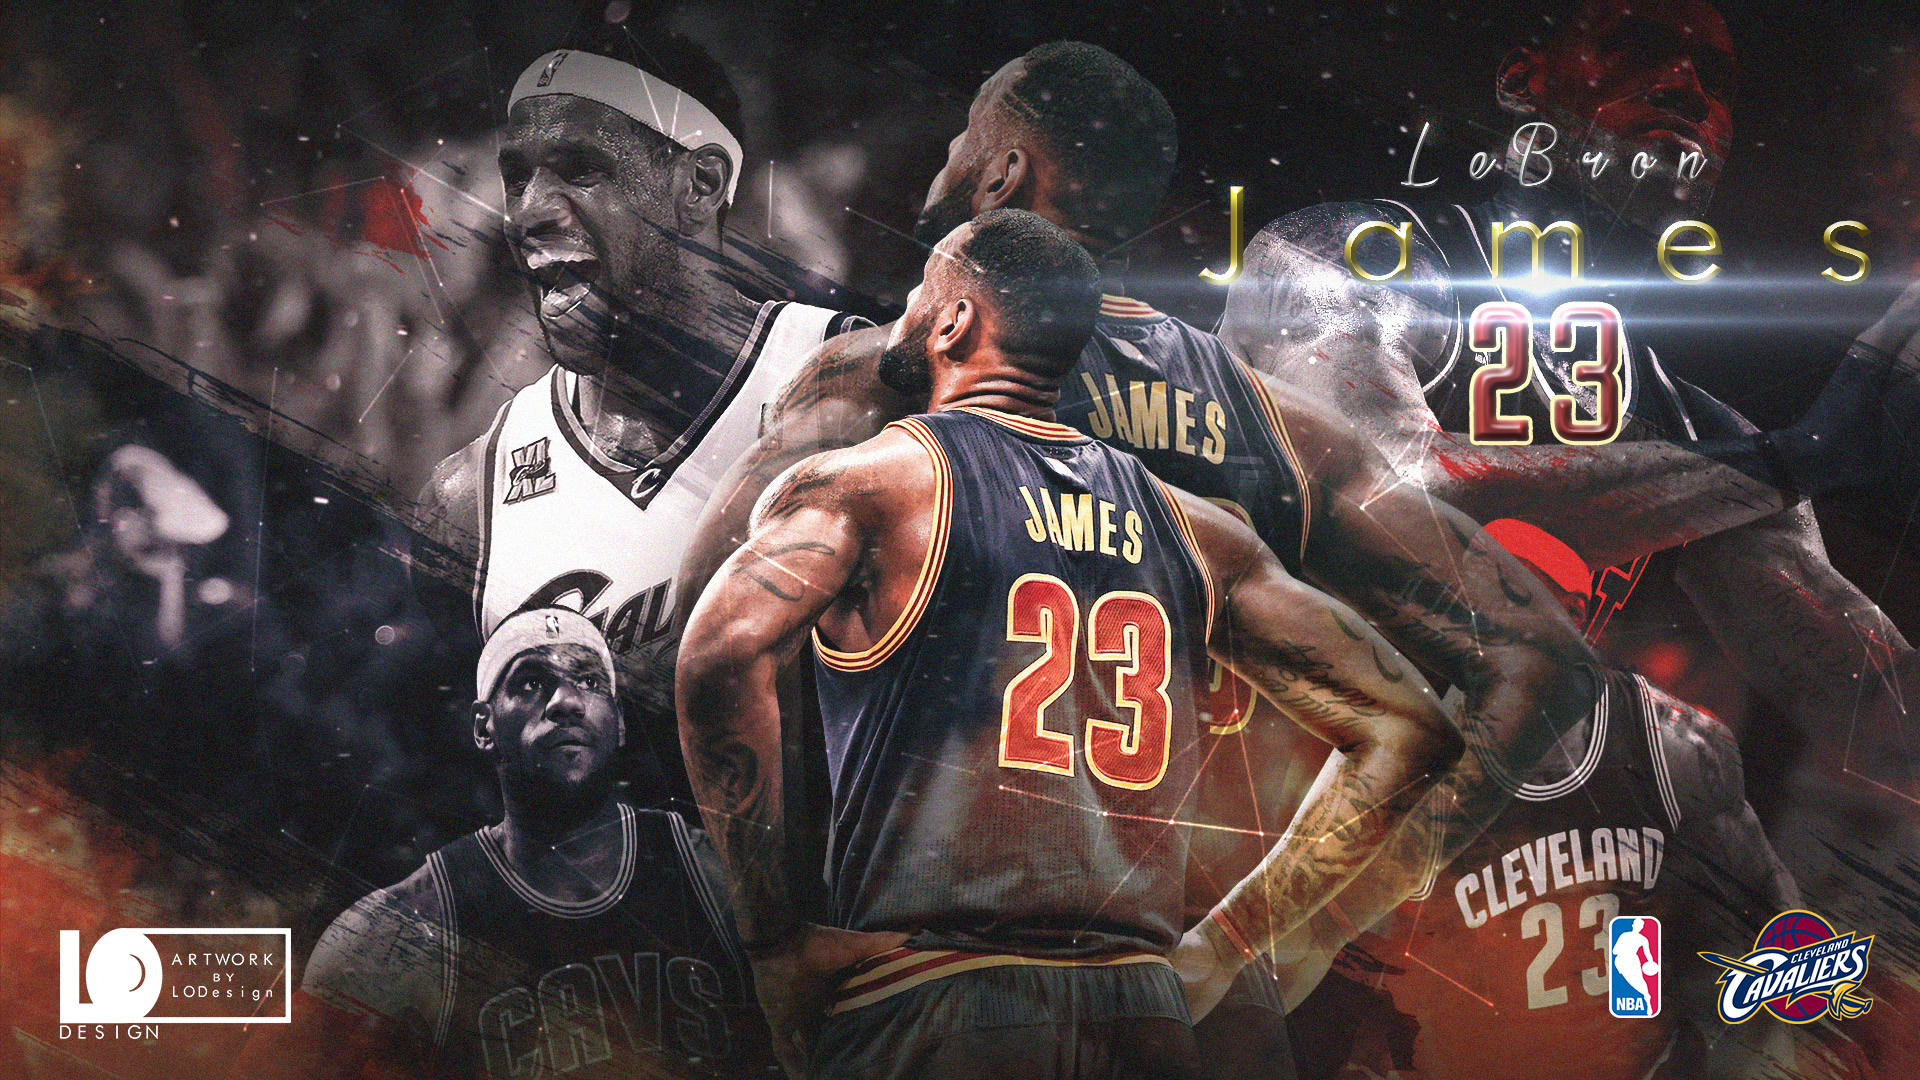 1920x1080 LeBron James 2017 Playoffs Wallpaper Download Q